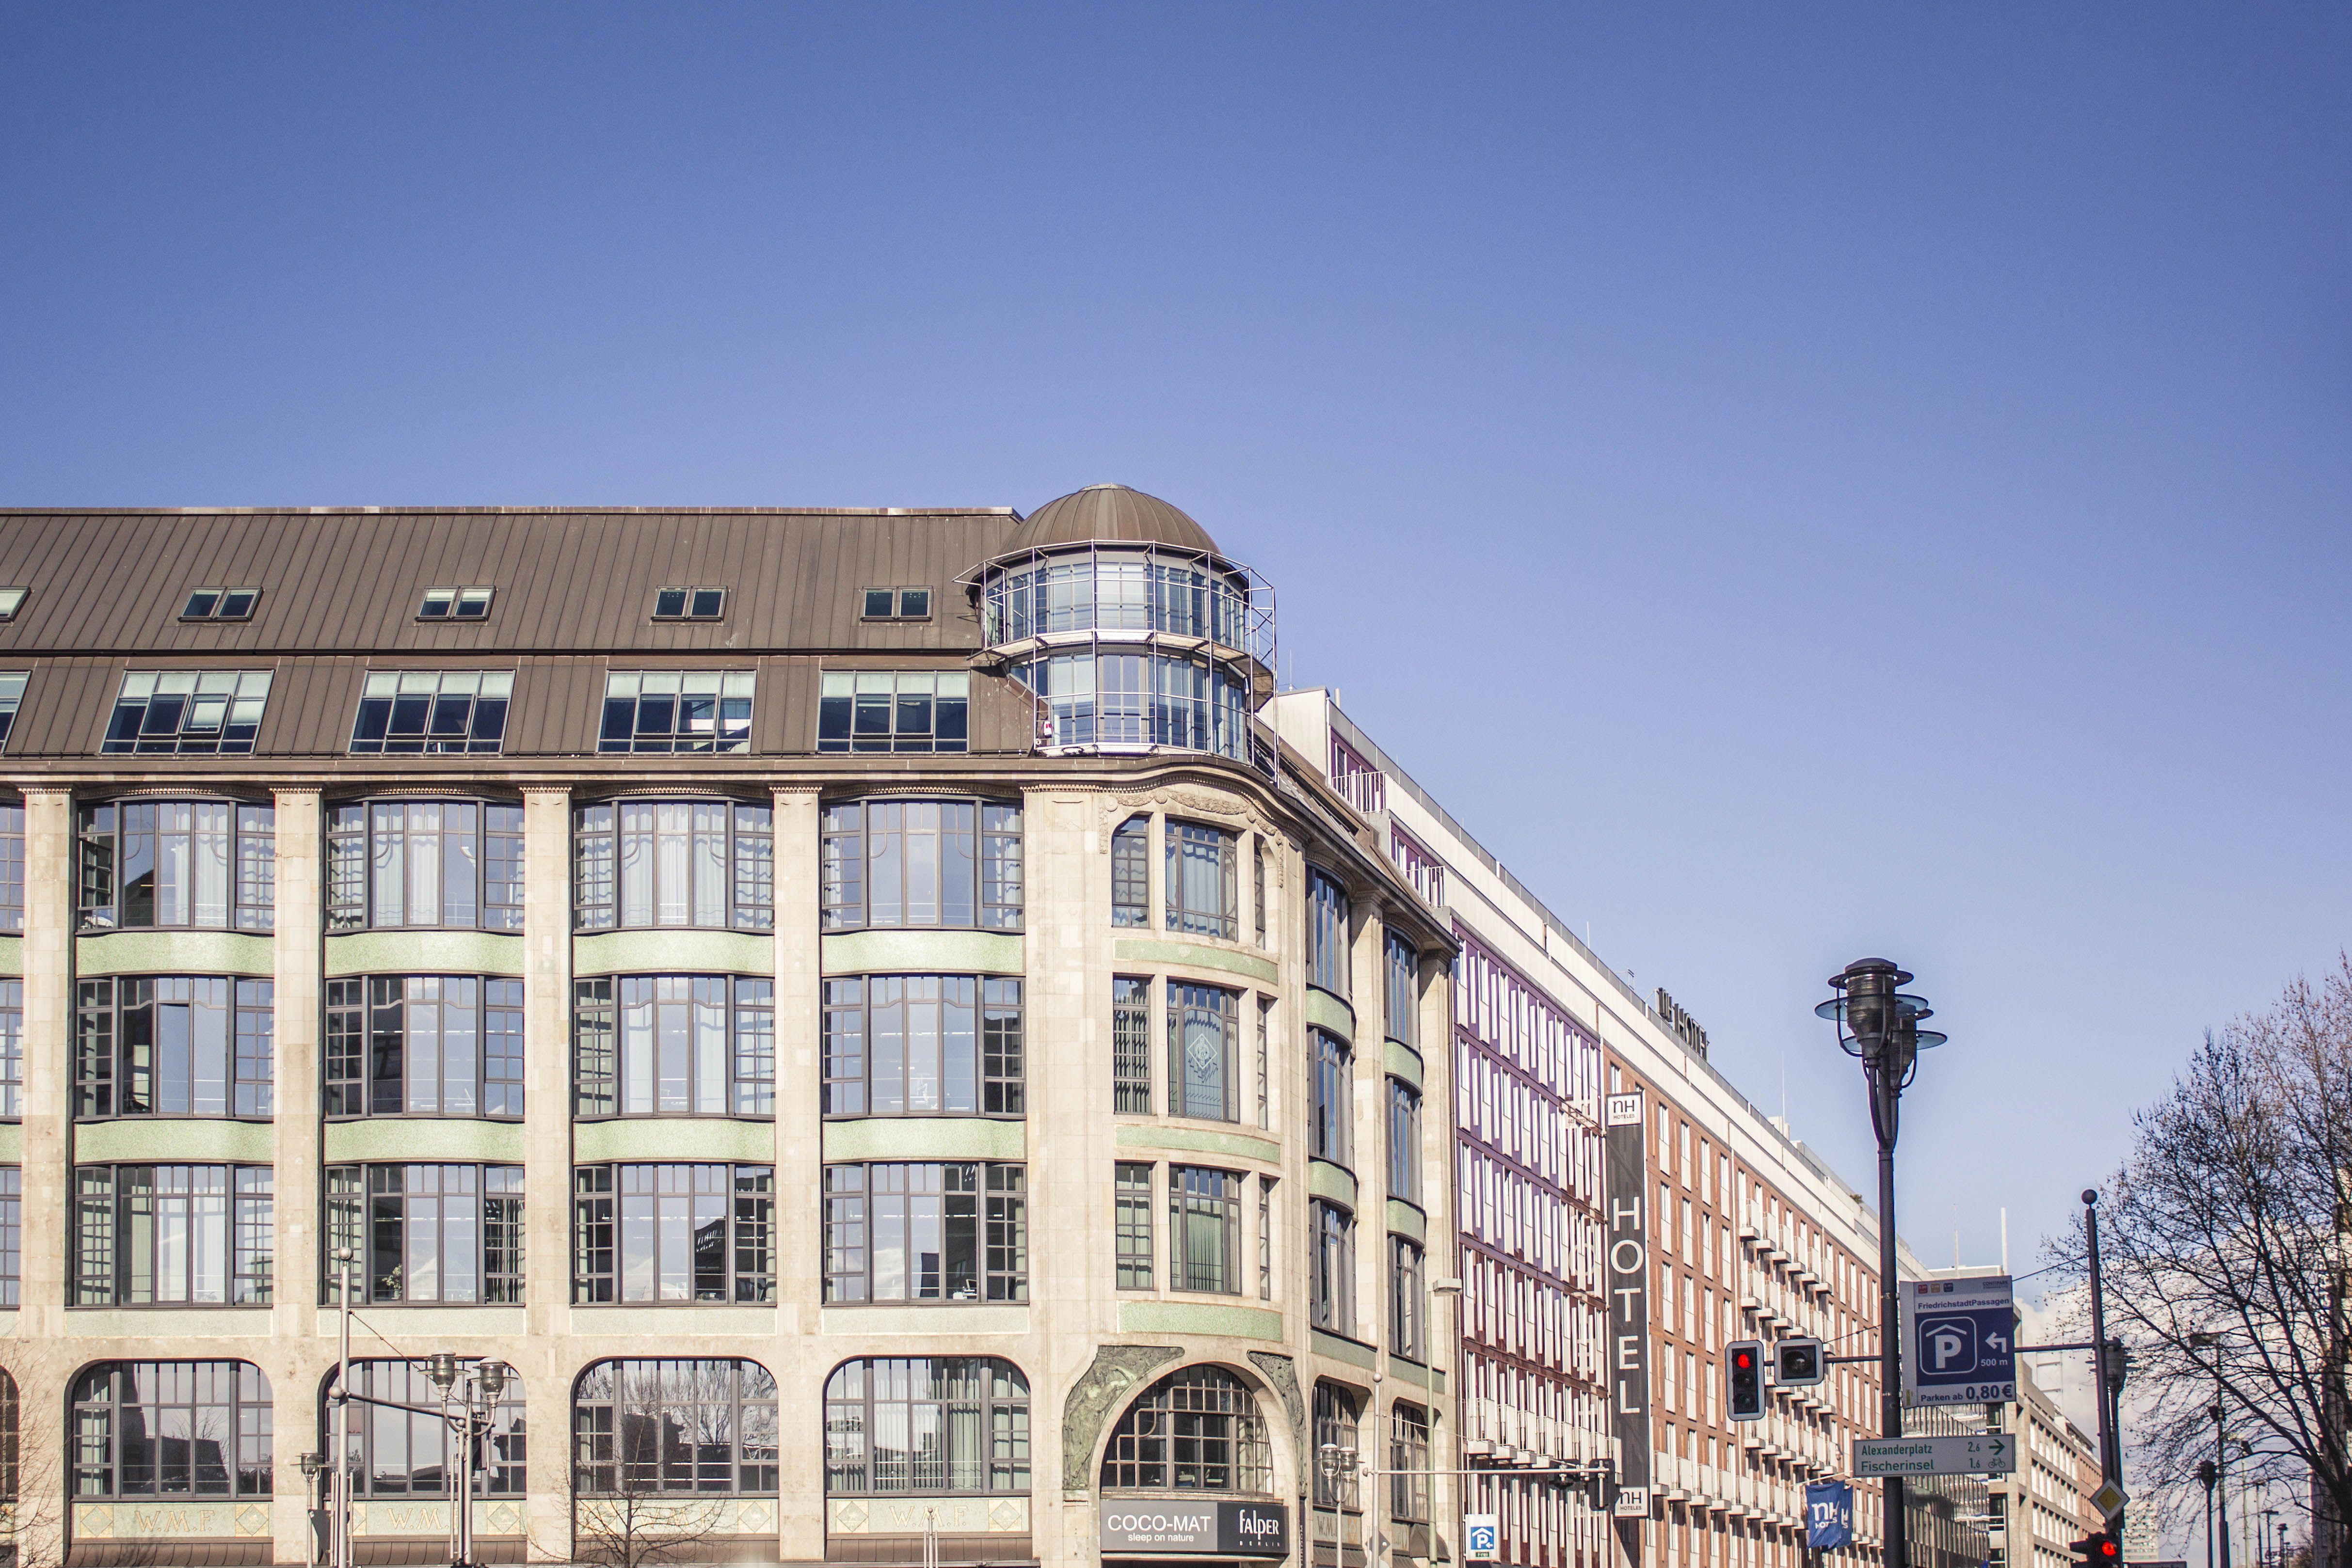 The Light Painters Loft | Streets of Berlin